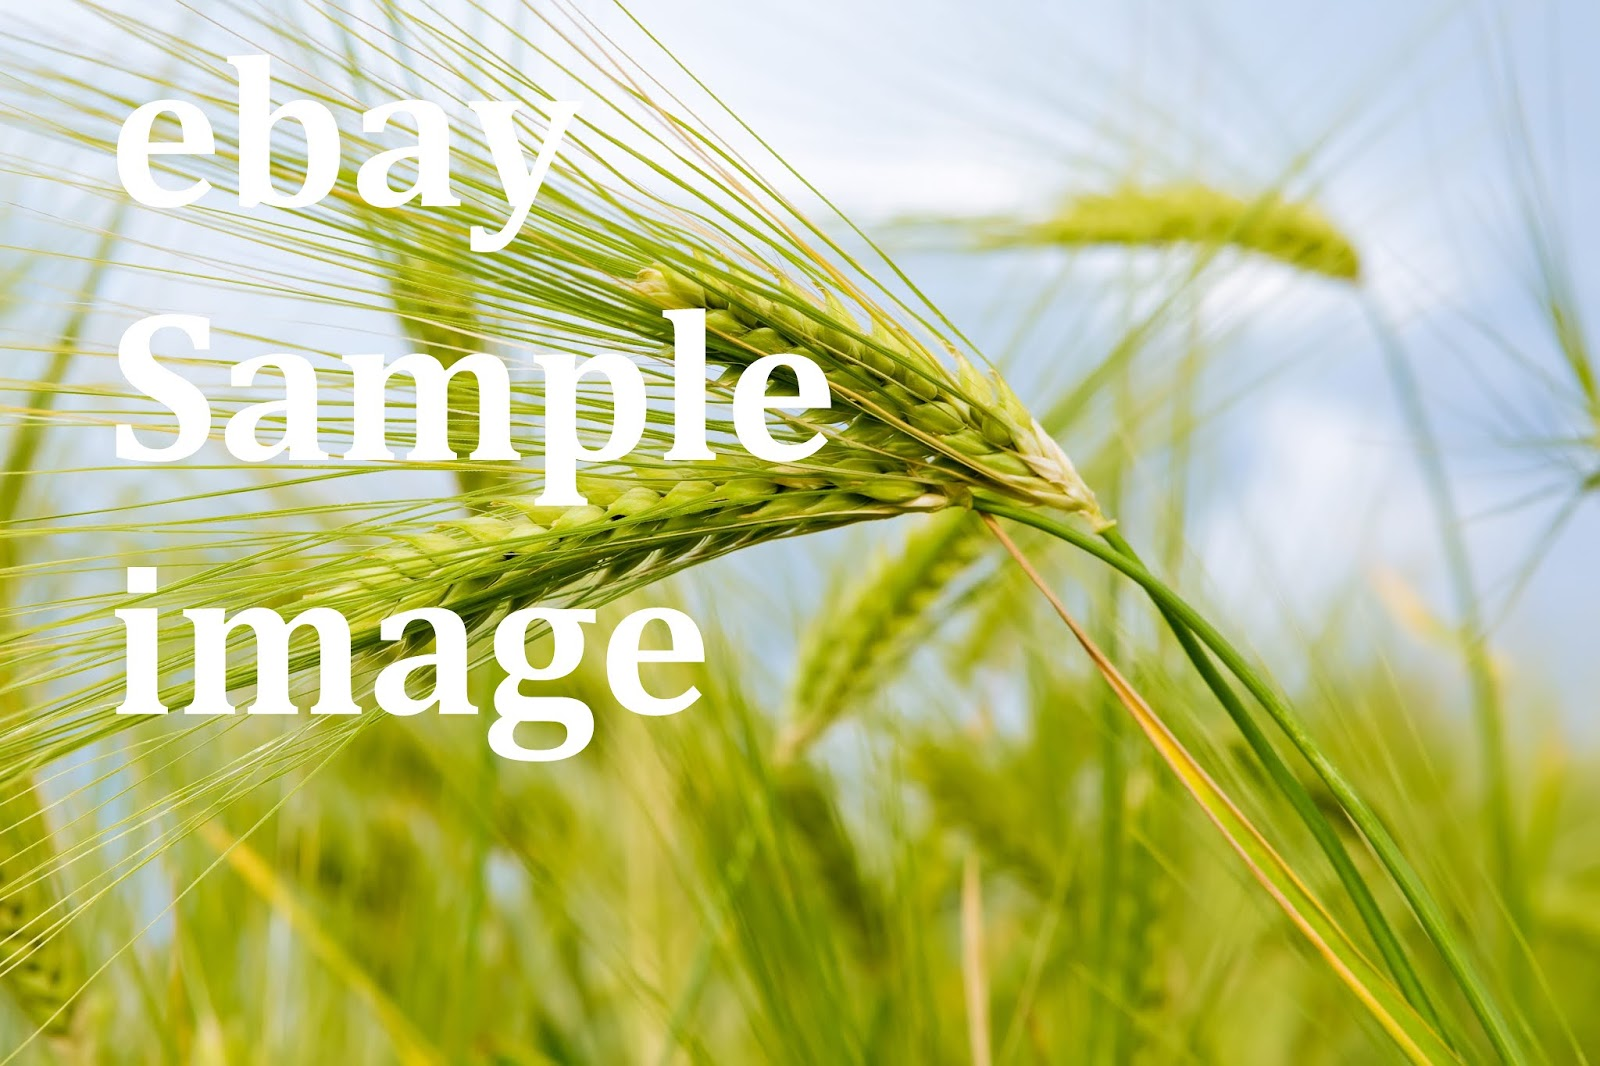 New Desktop** Image** Closeup/_Ear/_botany/_Nature Original Background Vision ***